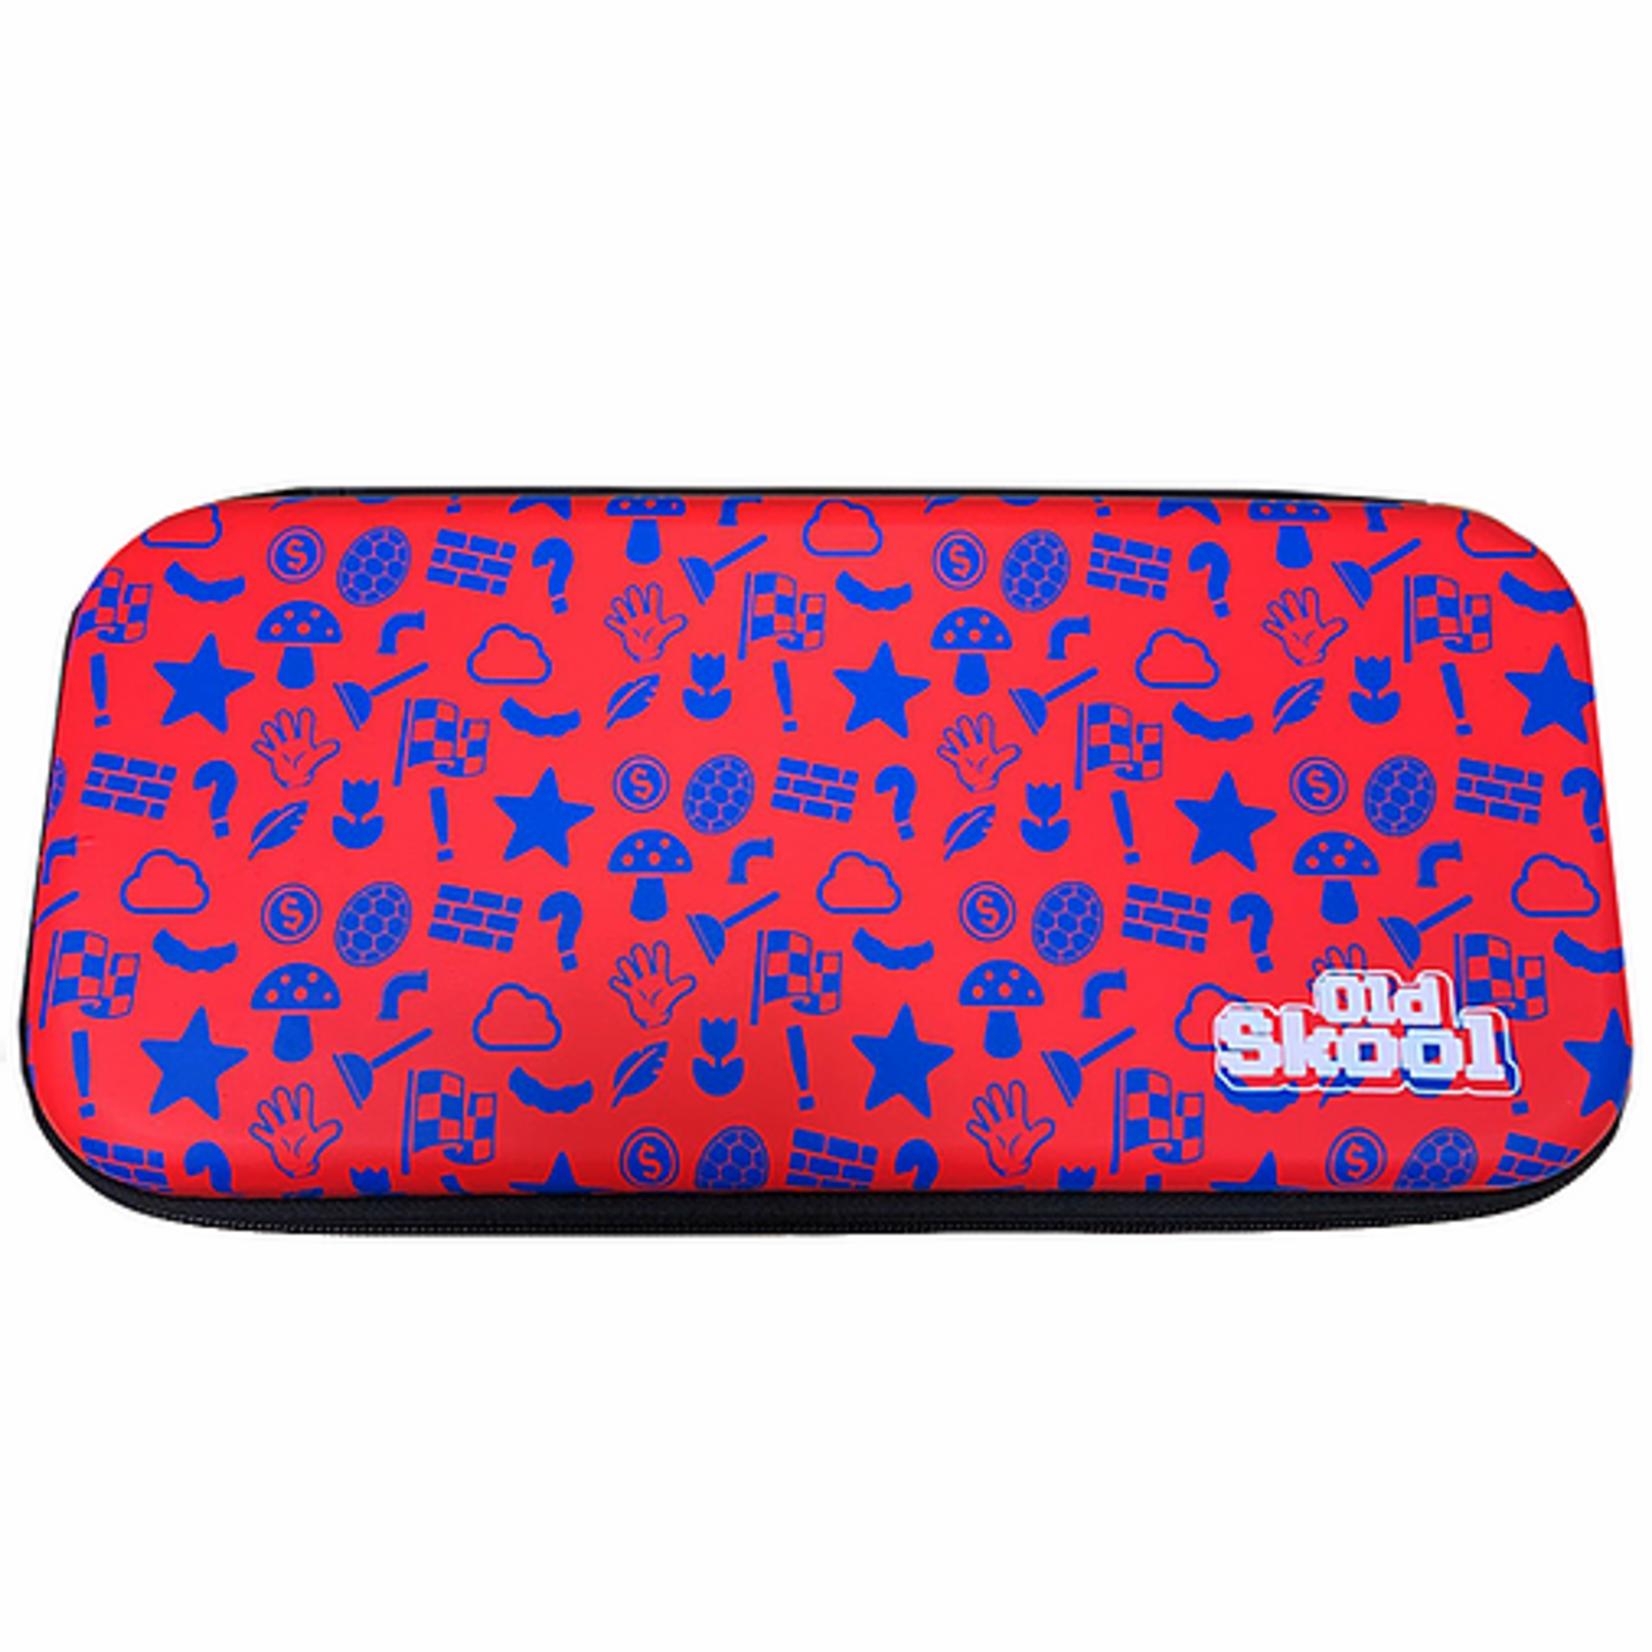 Old Skool Switch/Switch Lite Travel Case